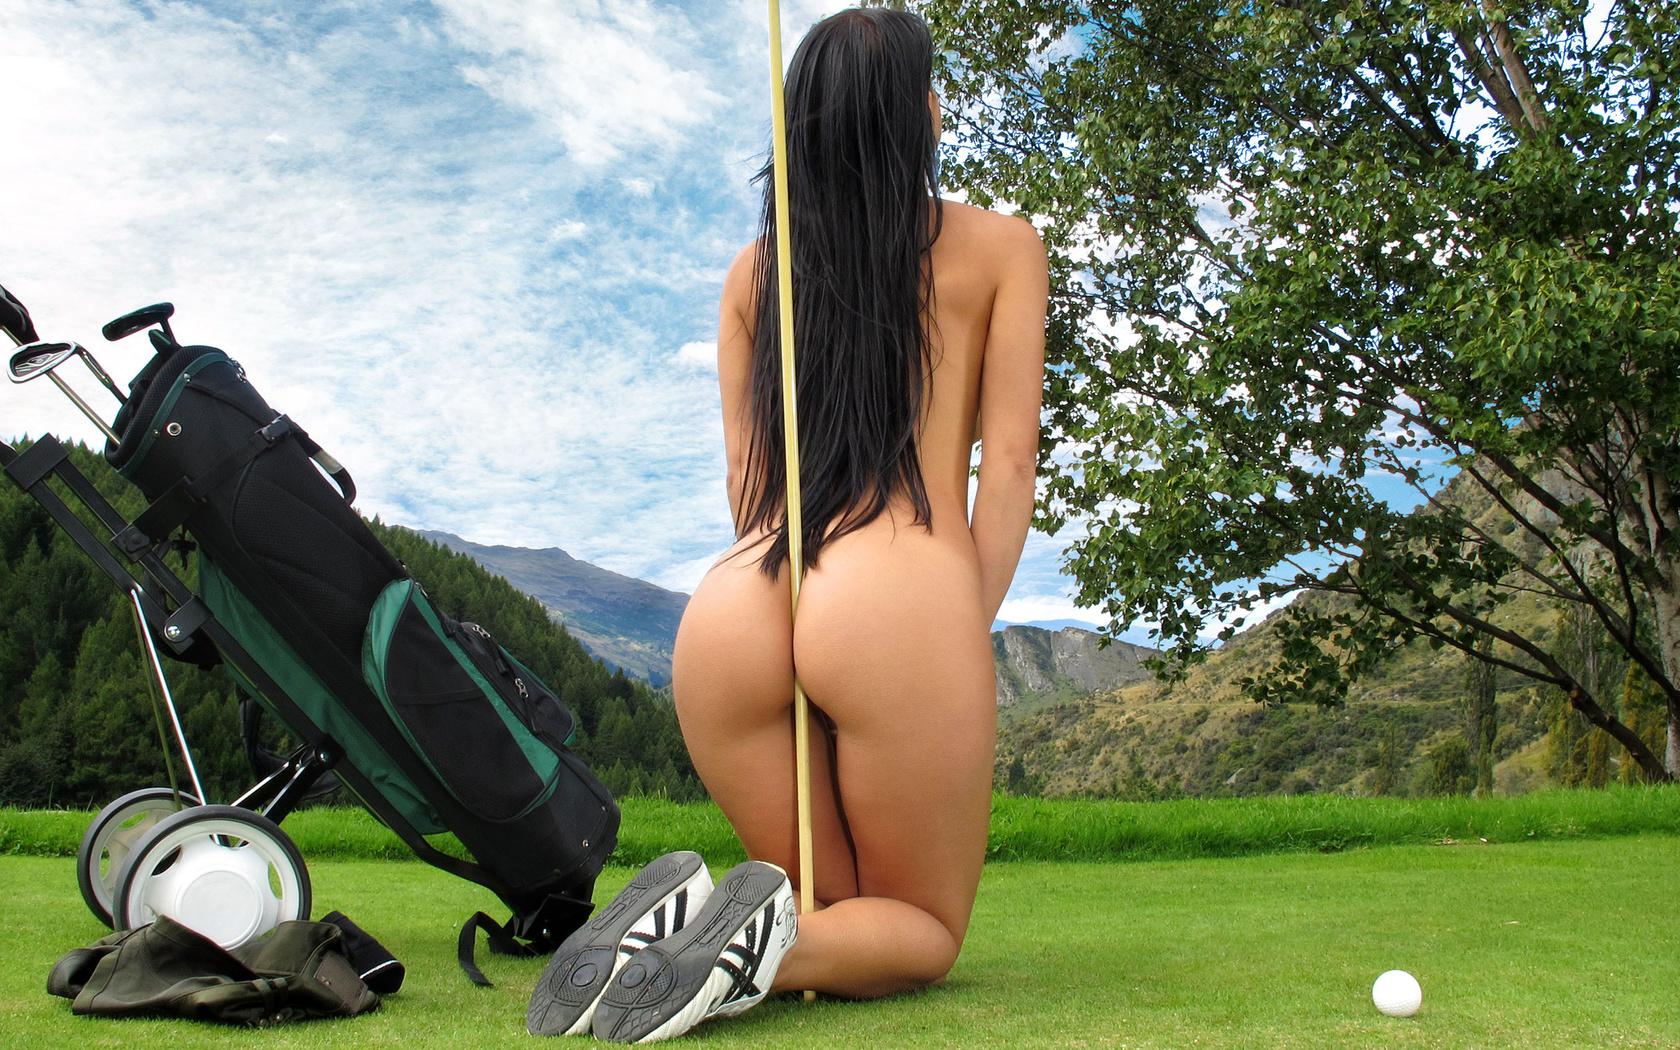 Nude girl golfing fuck picfetish